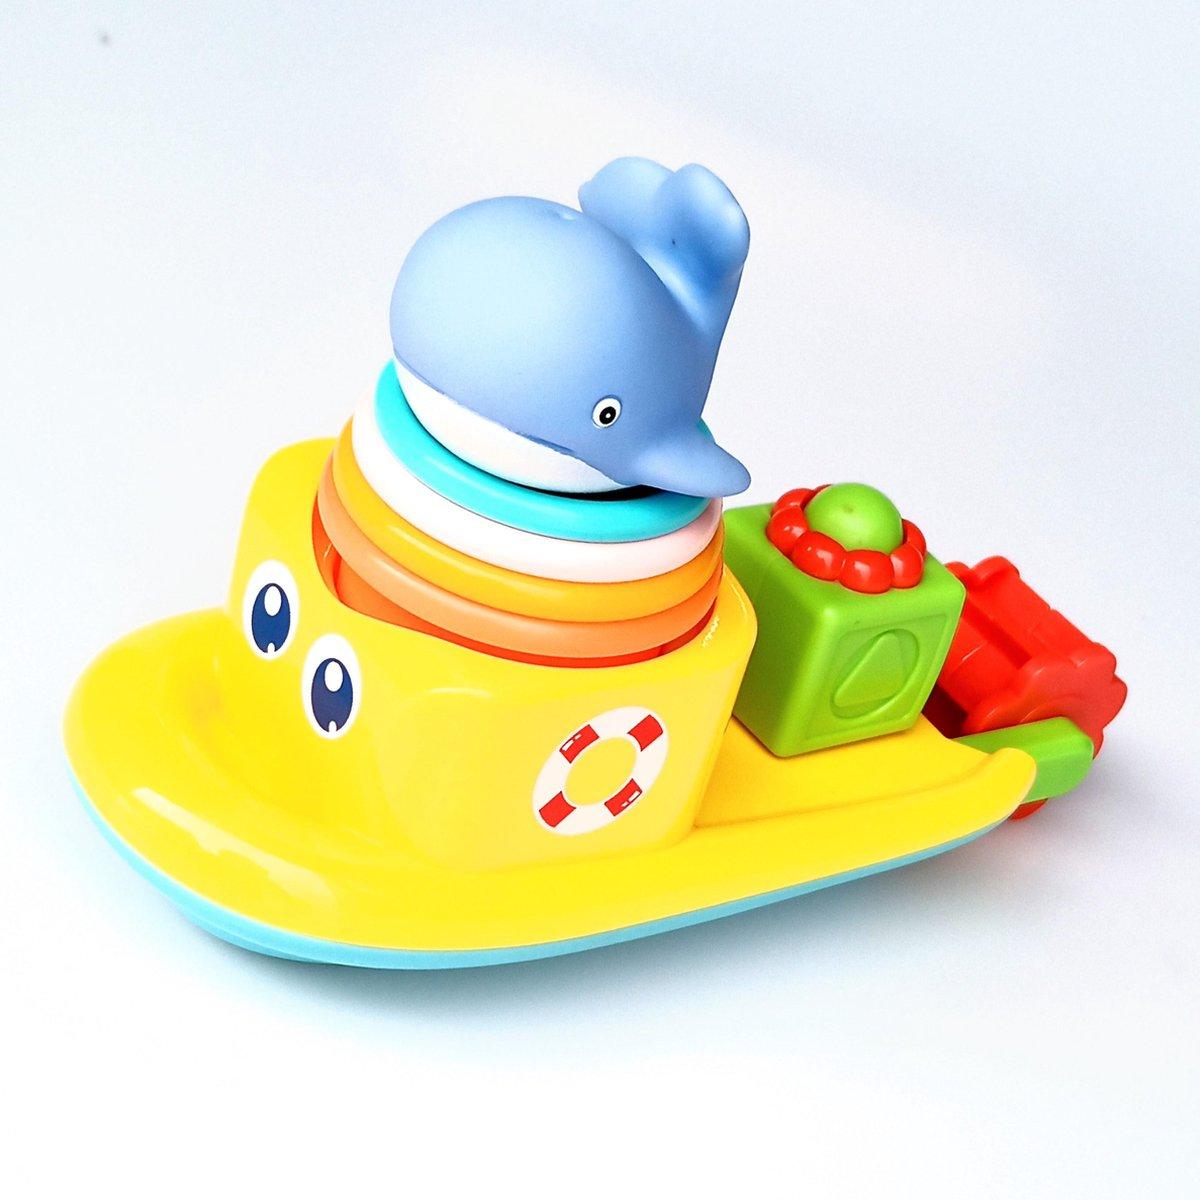 Jobber Waterplay Badspeelgoed - Waterrad Bad Boot - Stapel emmertjes